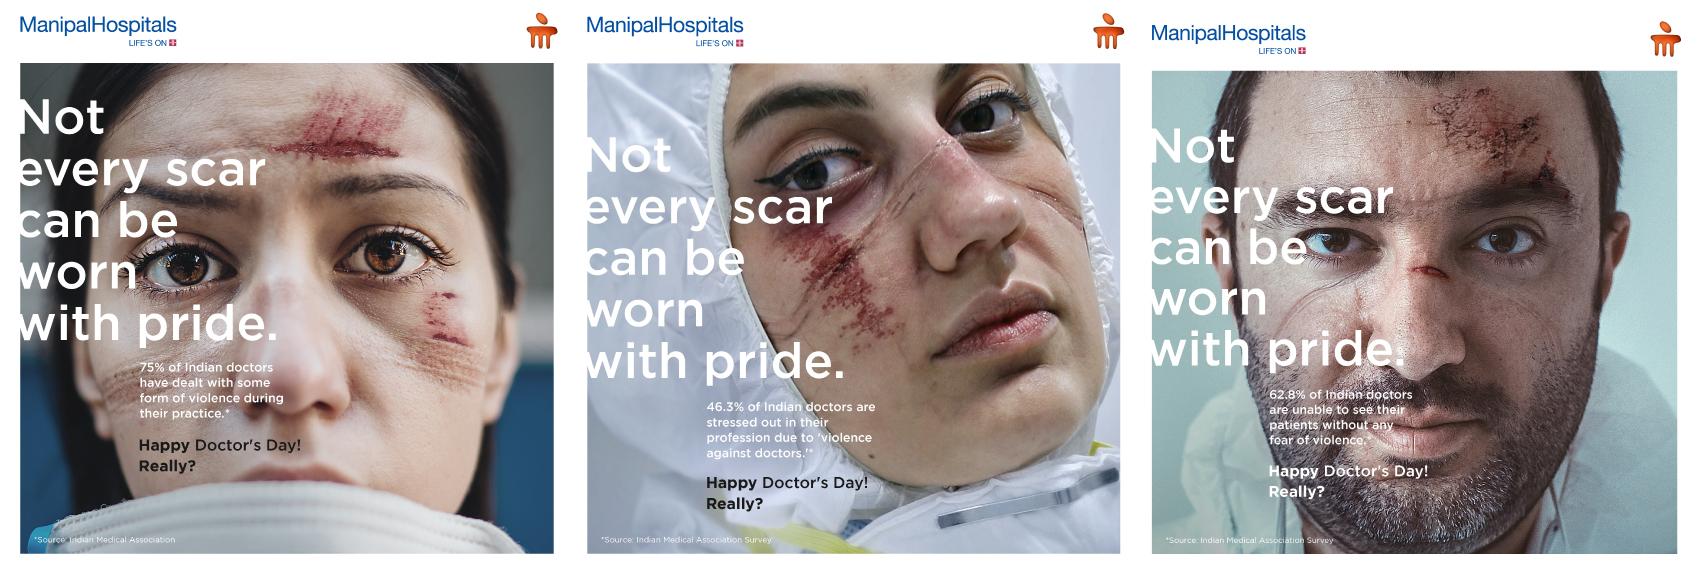 Manipal Hospitals Screen1